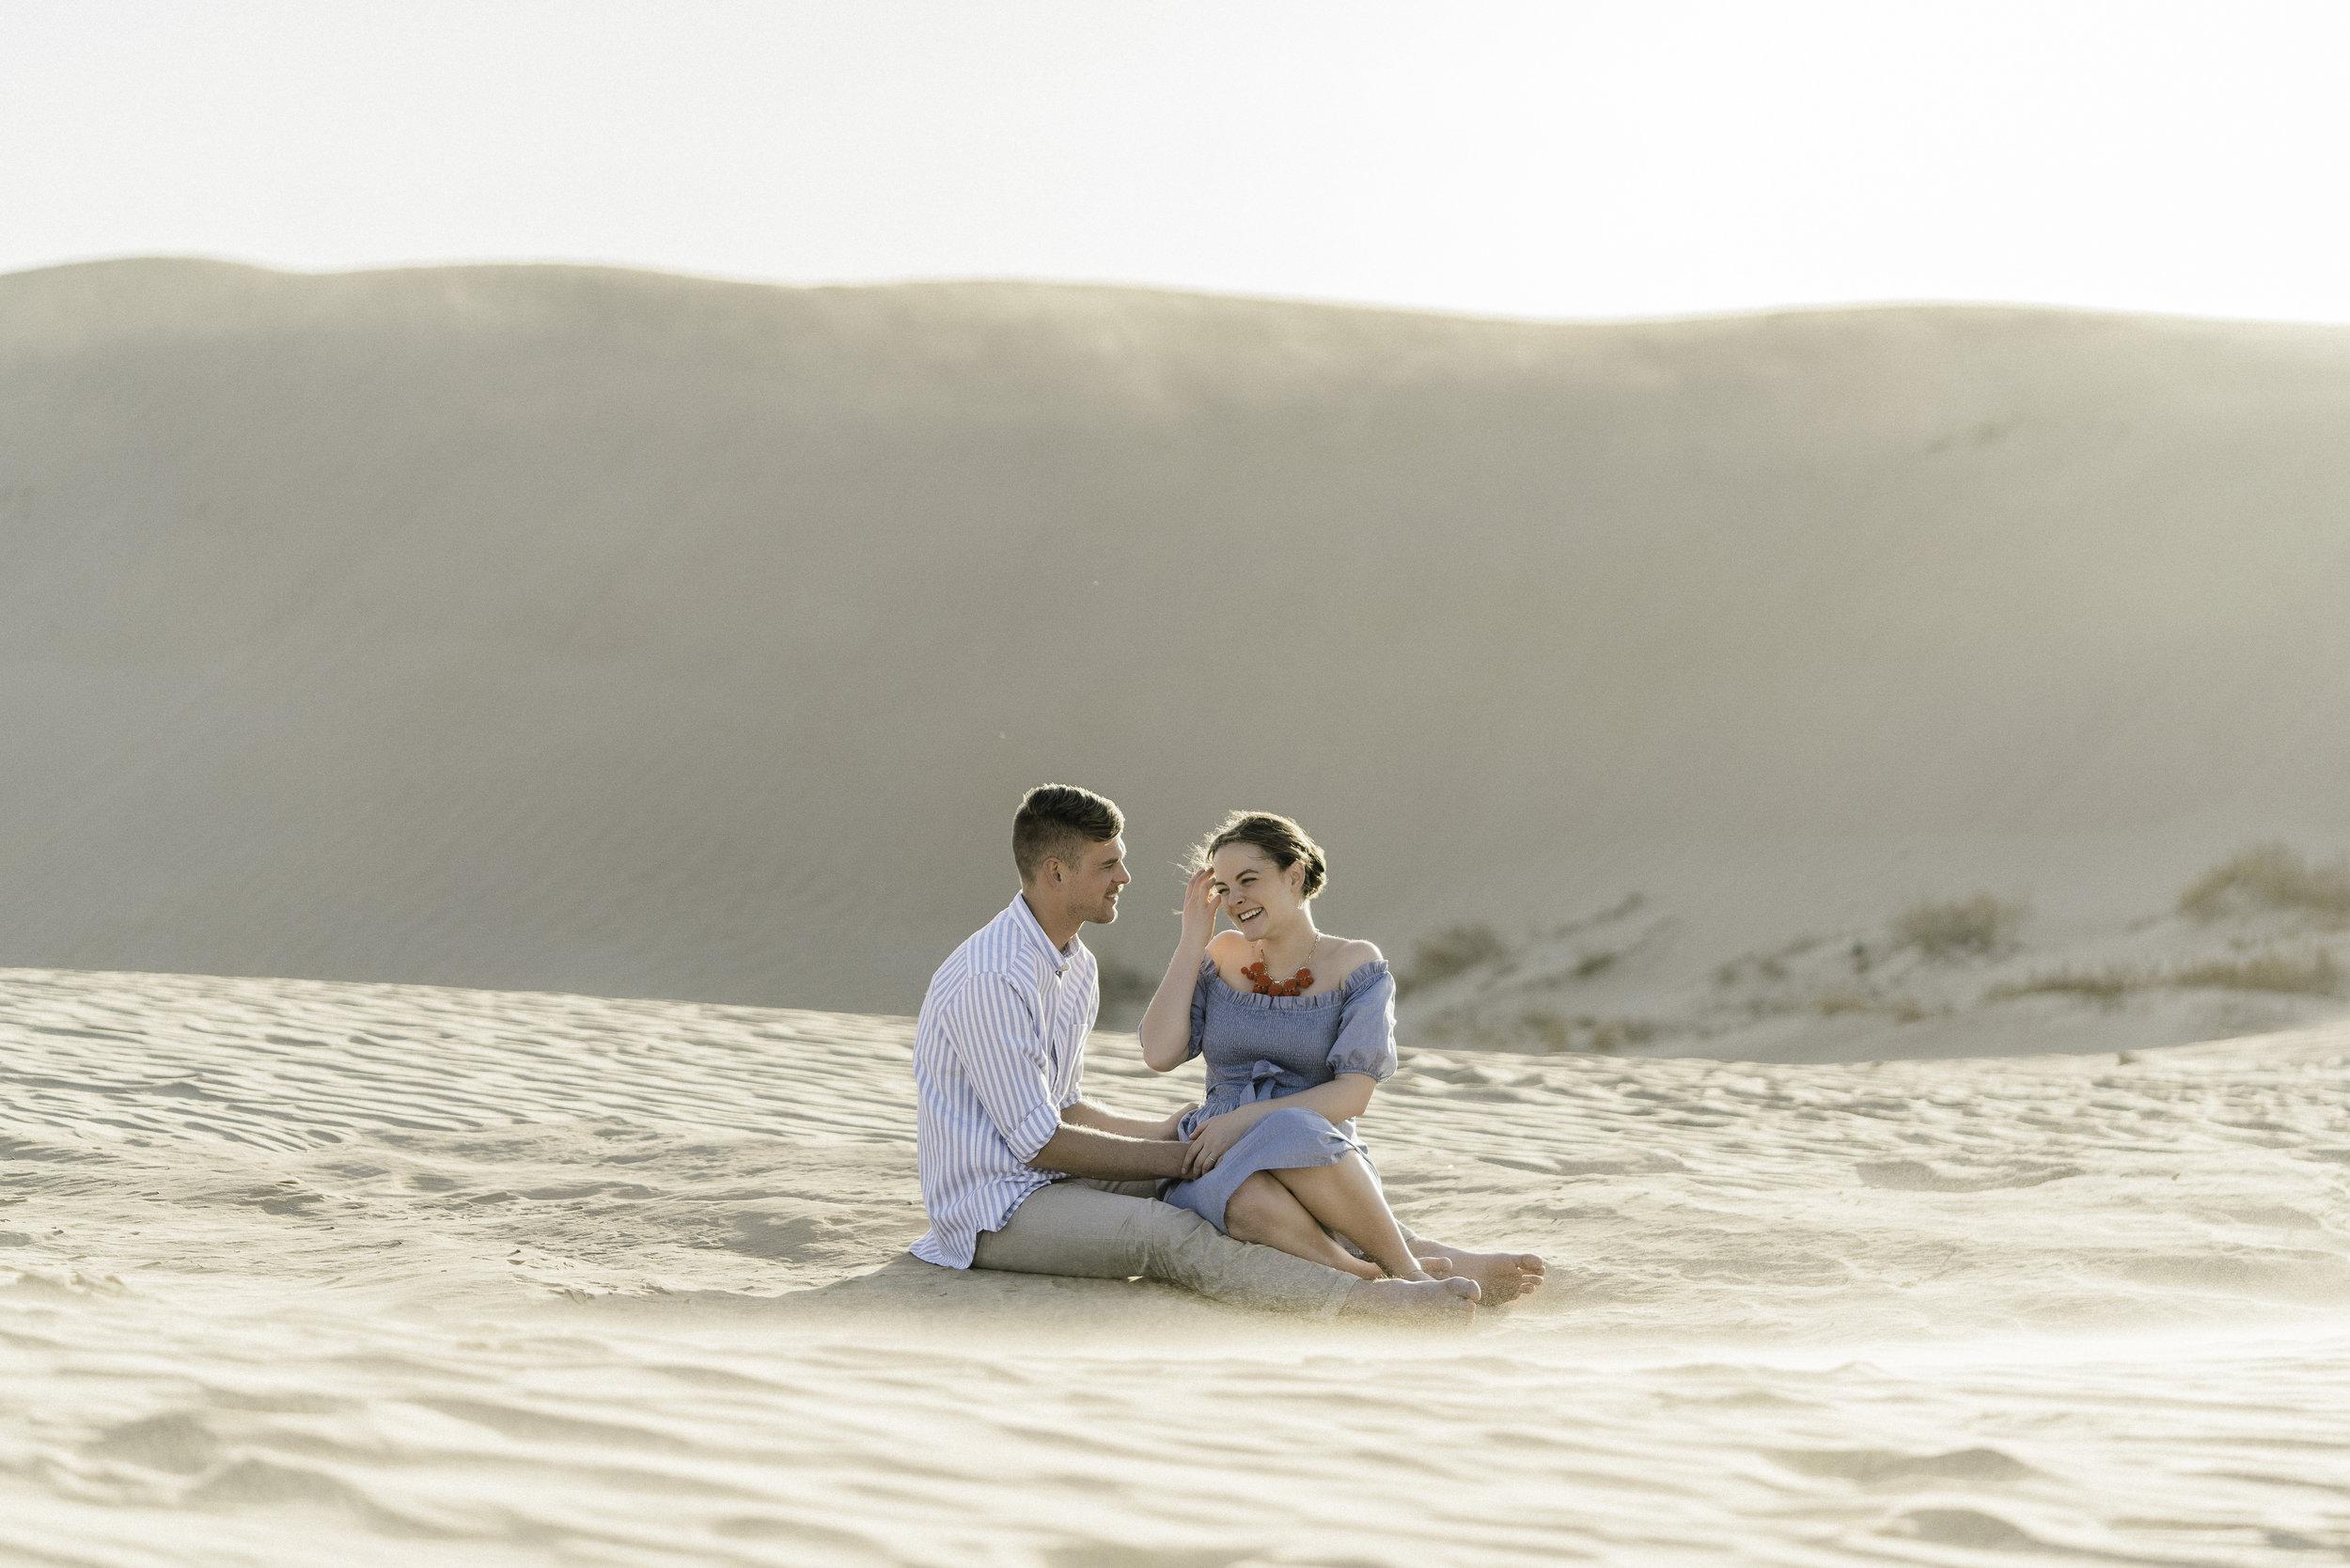 NewMexico-Sand-Dunes-Proposal-Carissa-and-Ben-1108.jpg